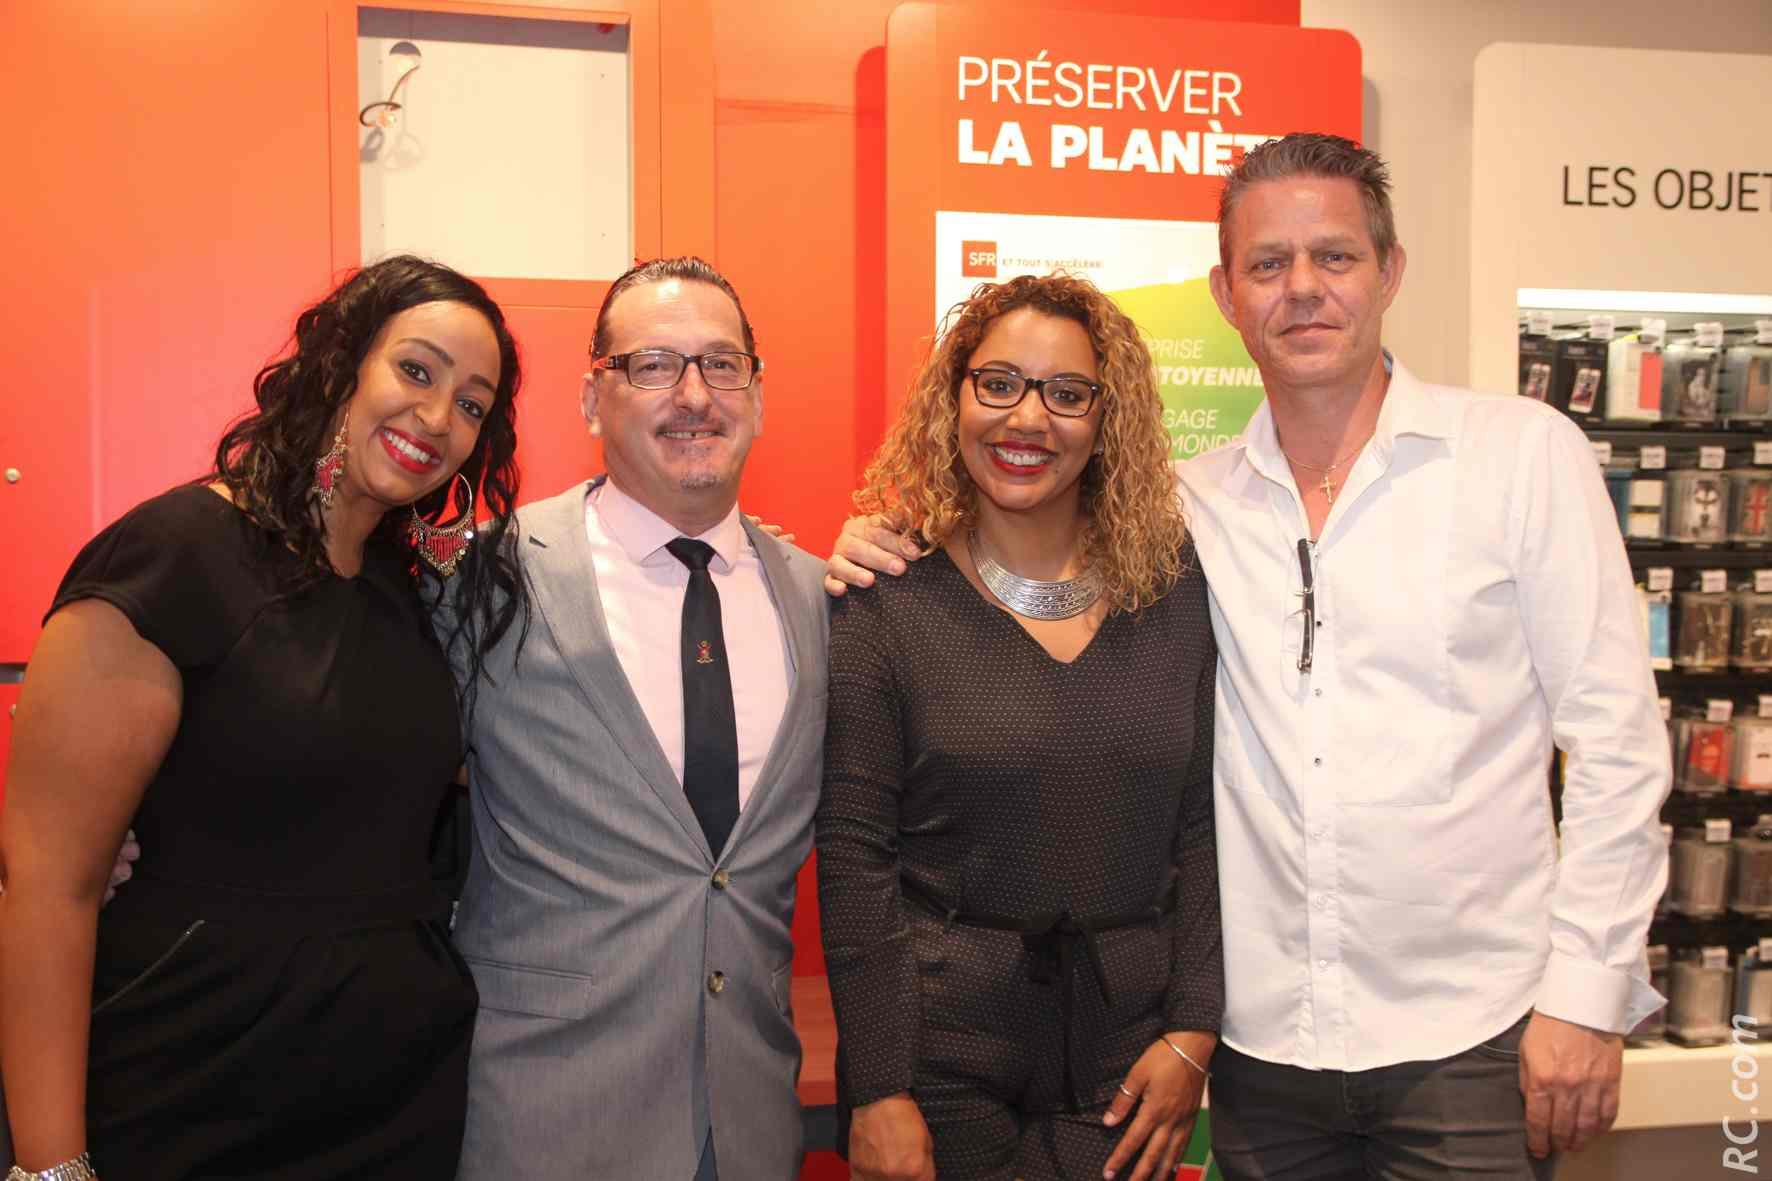 Cherine Bourot, Laurent Piédimonte, Jennifer Robur, et Olivier Durand